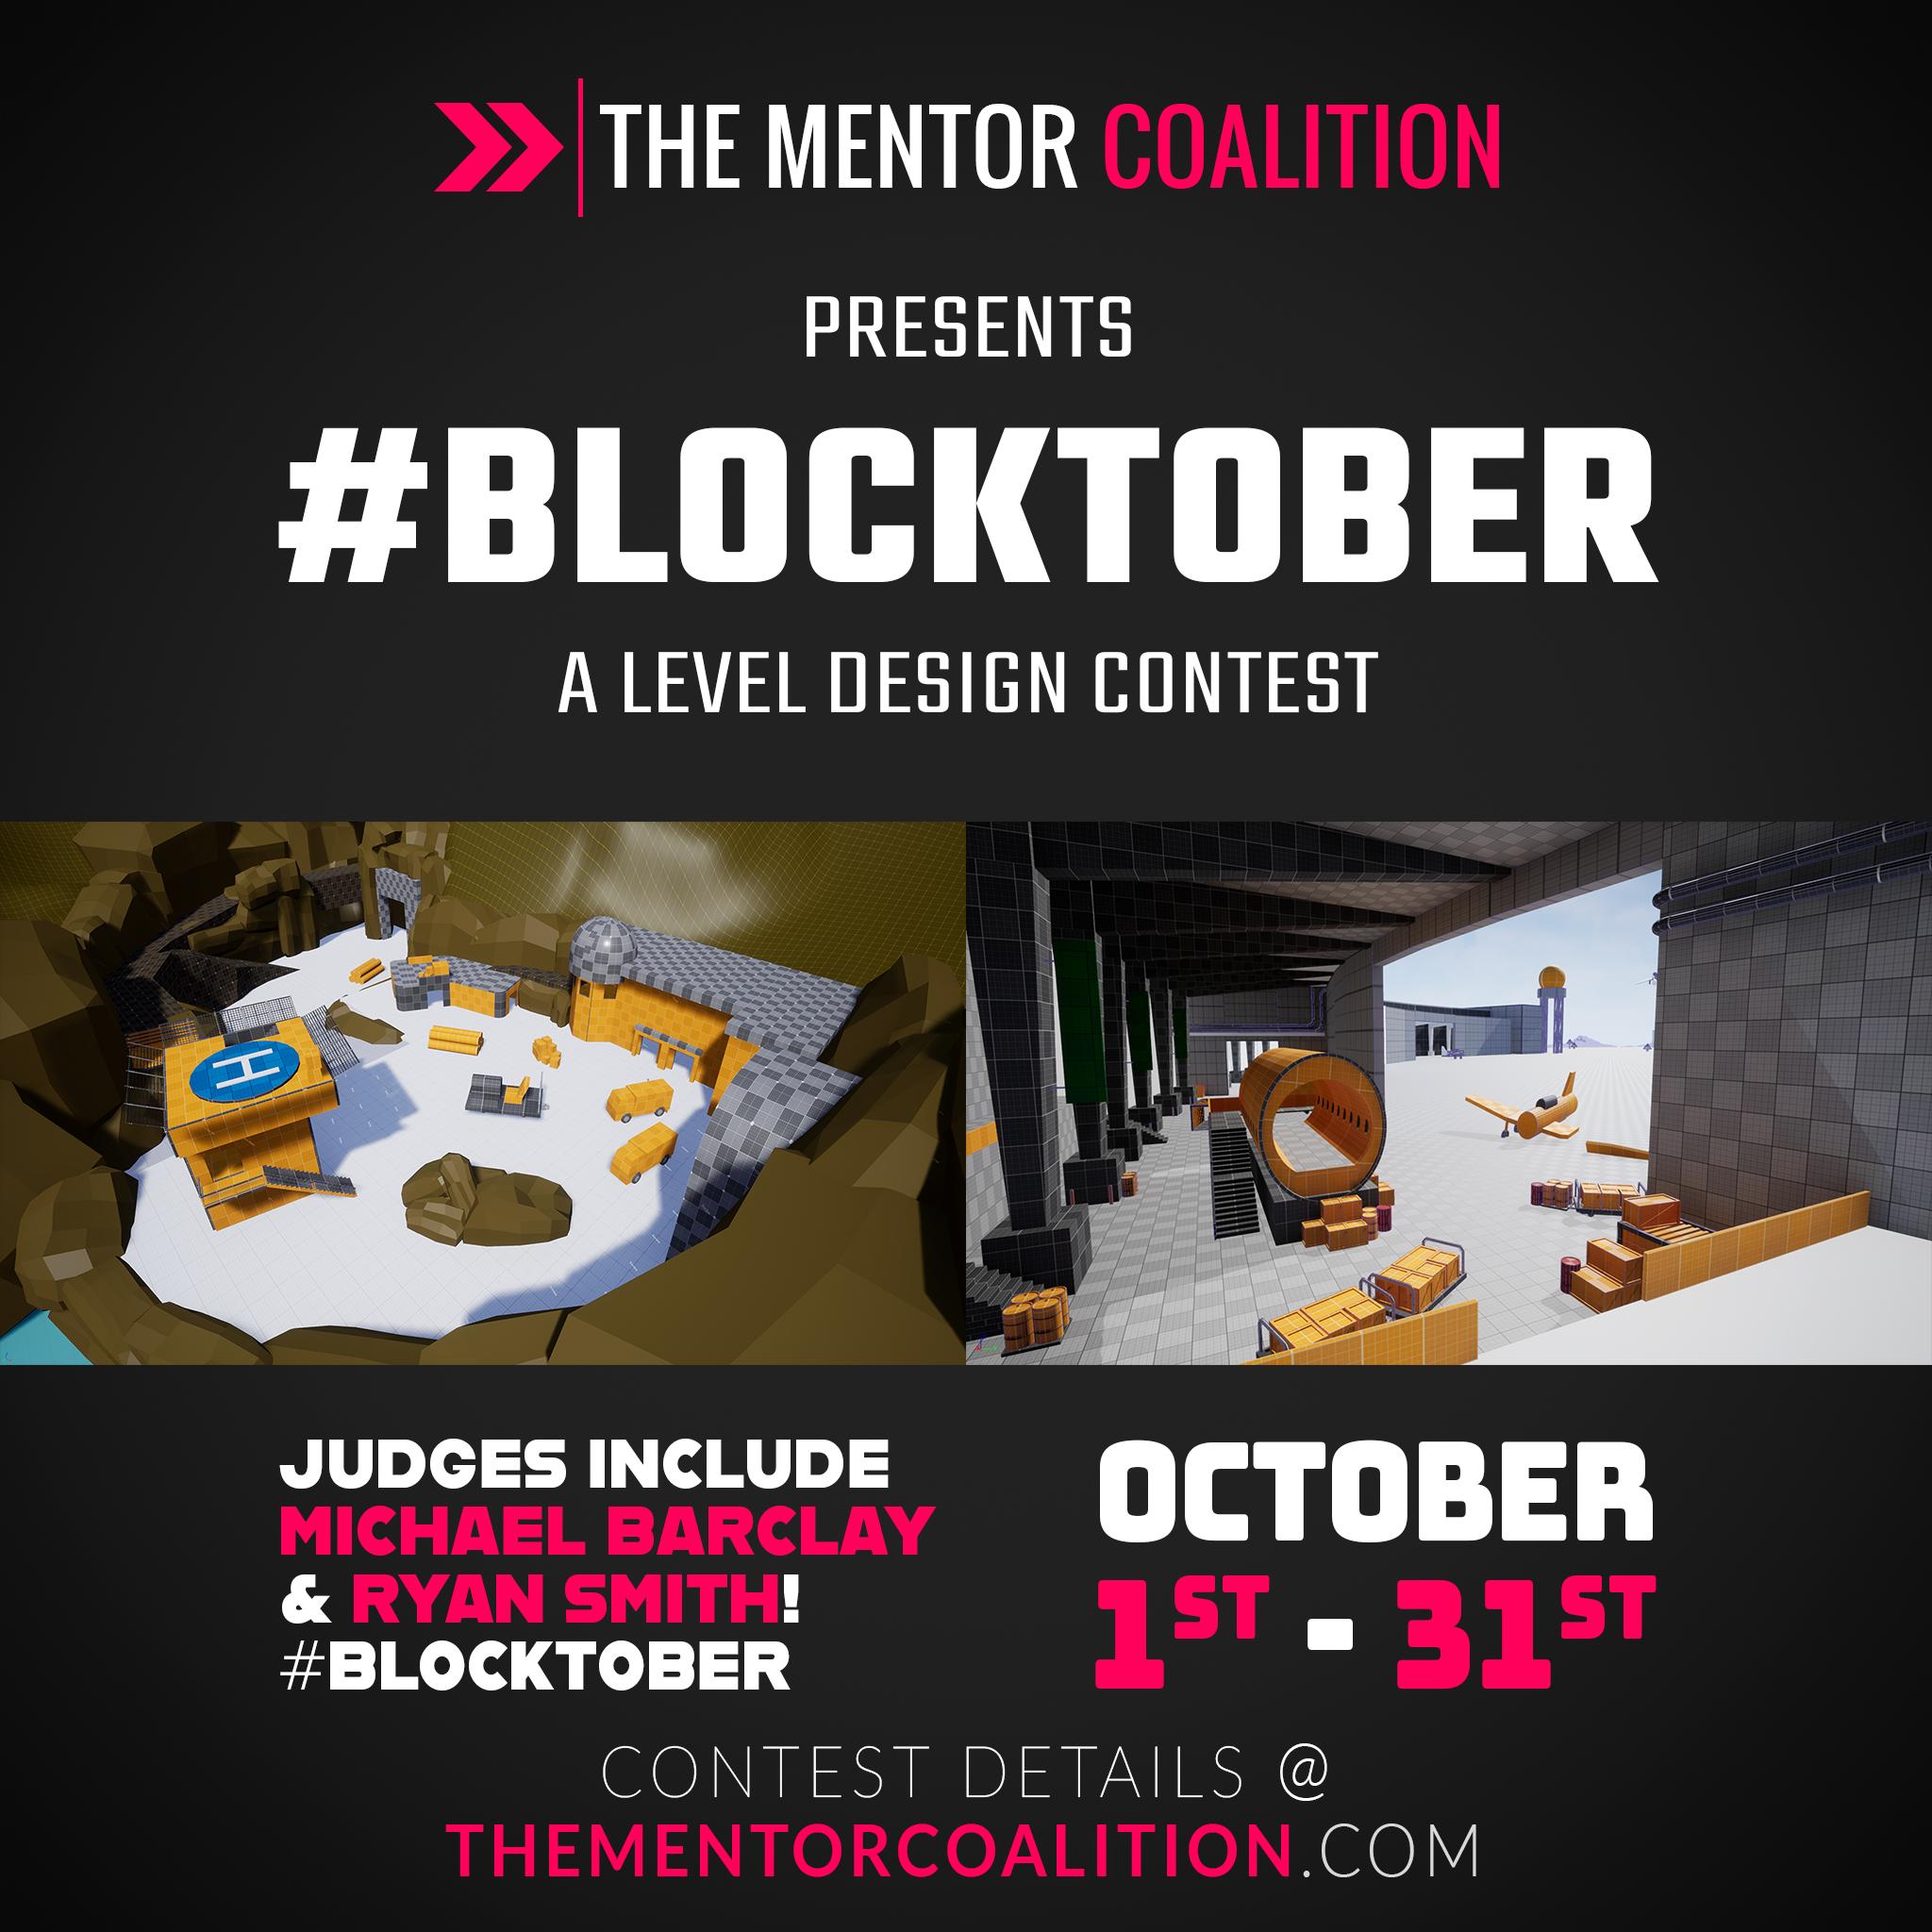 #BLOCKTOBER 19 - A Level Design Contest